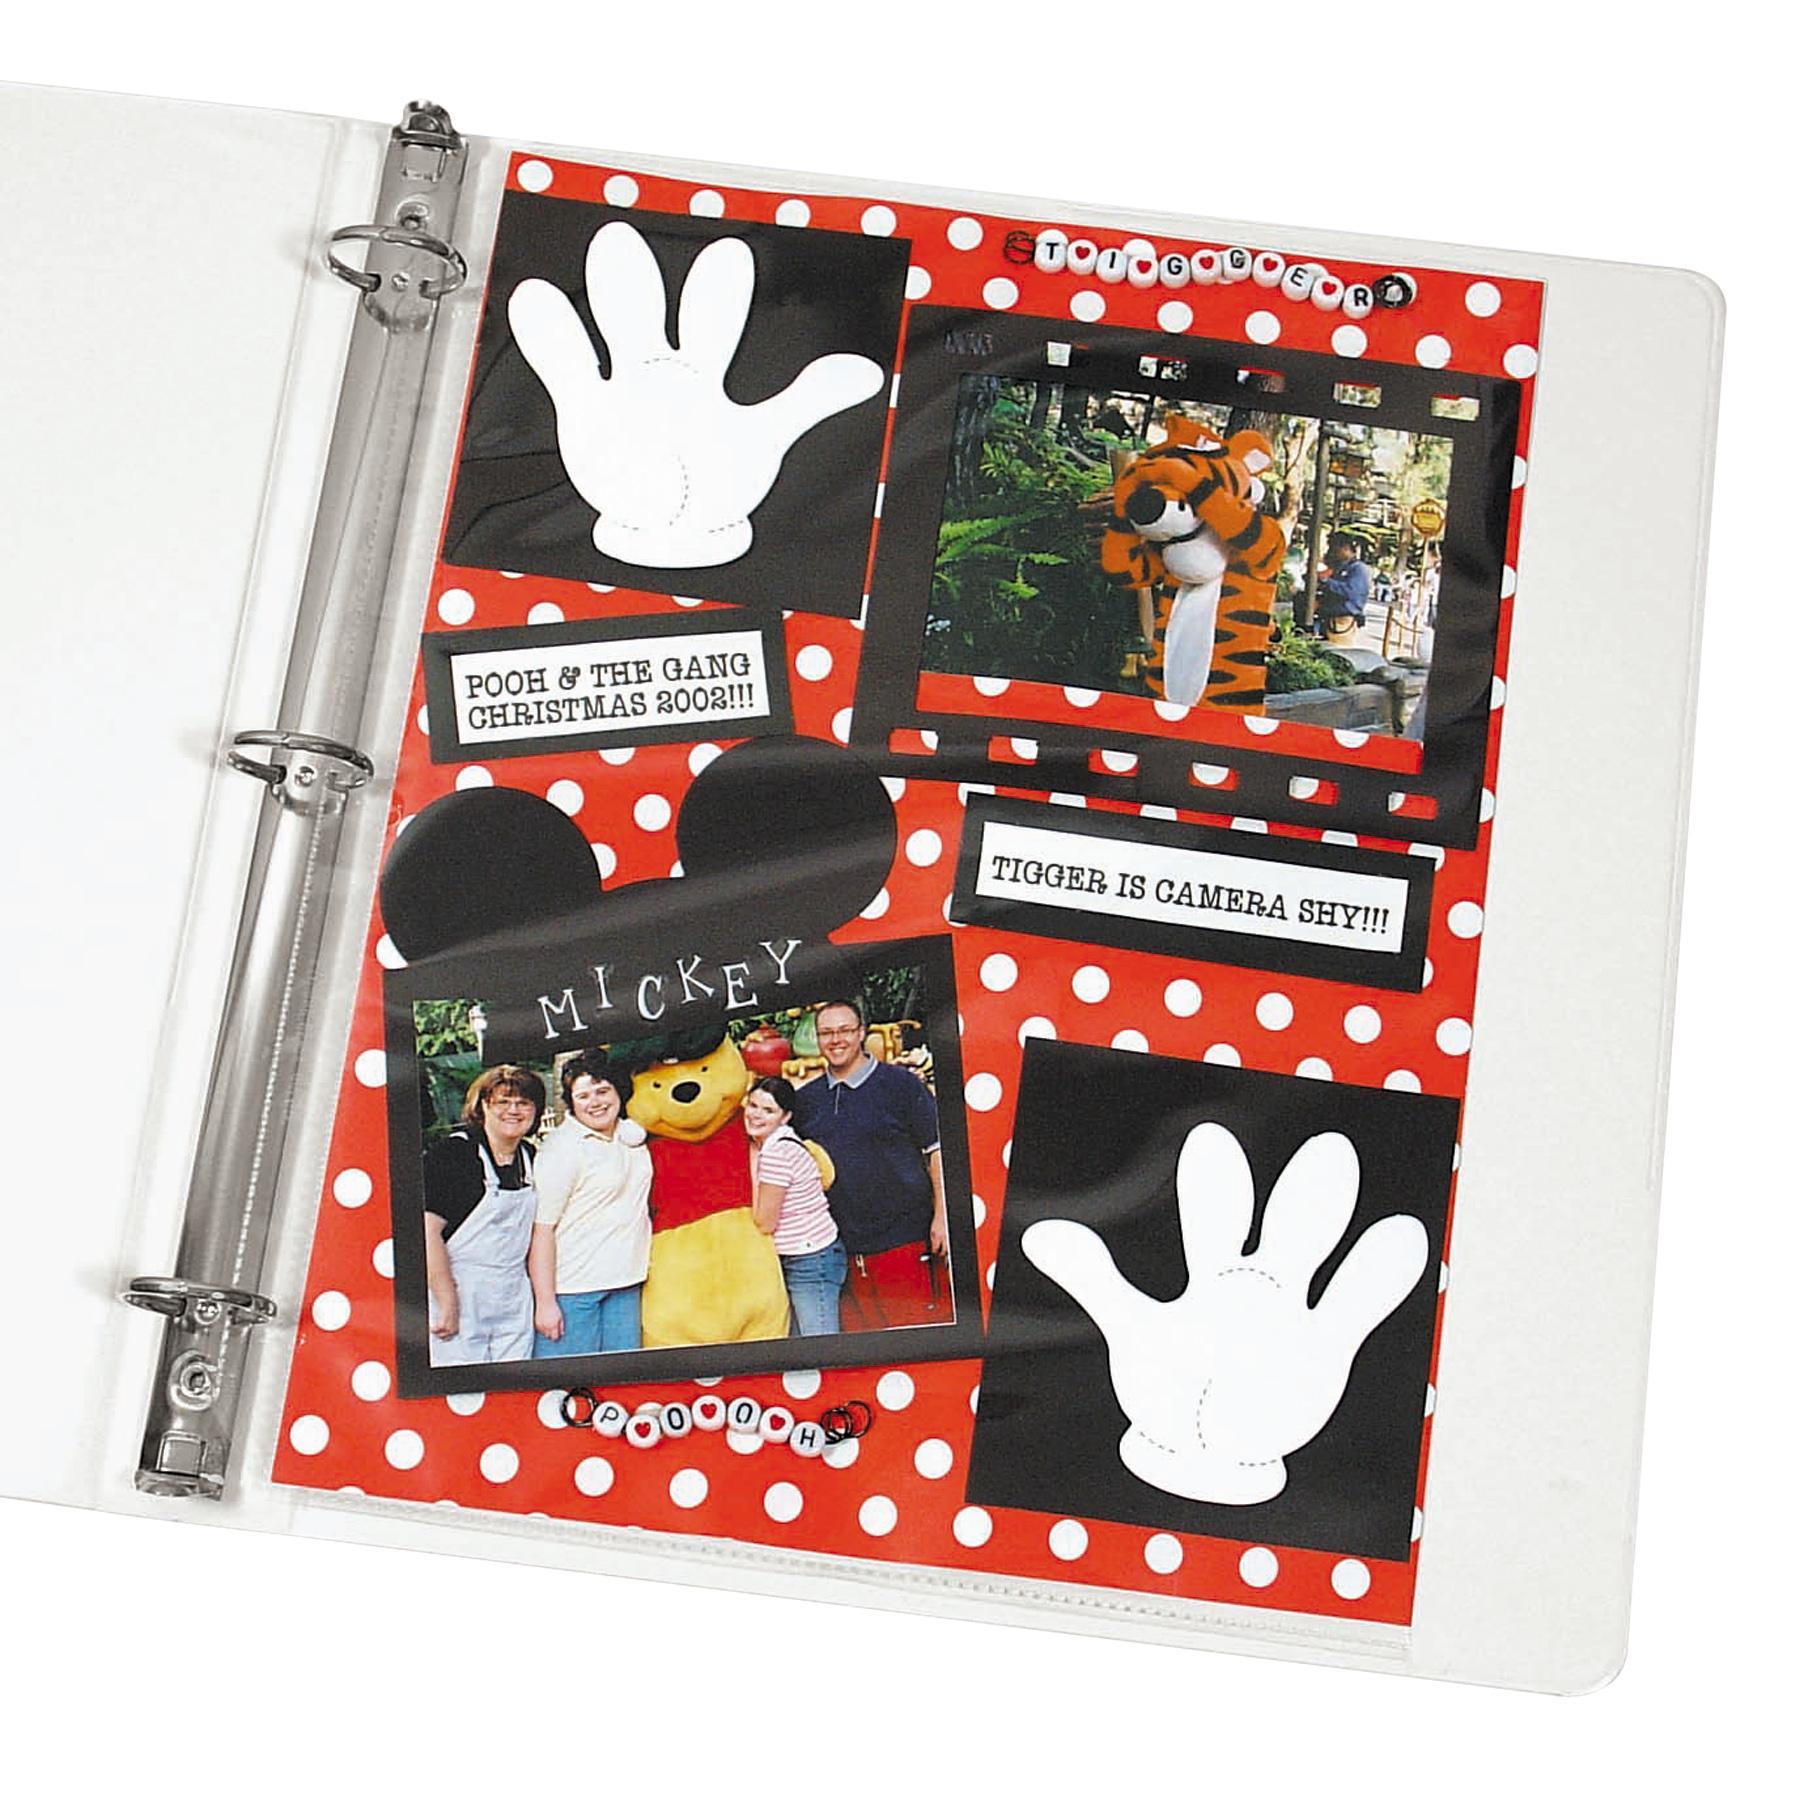 Top Photo Book: Amazon.com: C-Line Memory Book 11 X 8.5 Inch Scrapbook